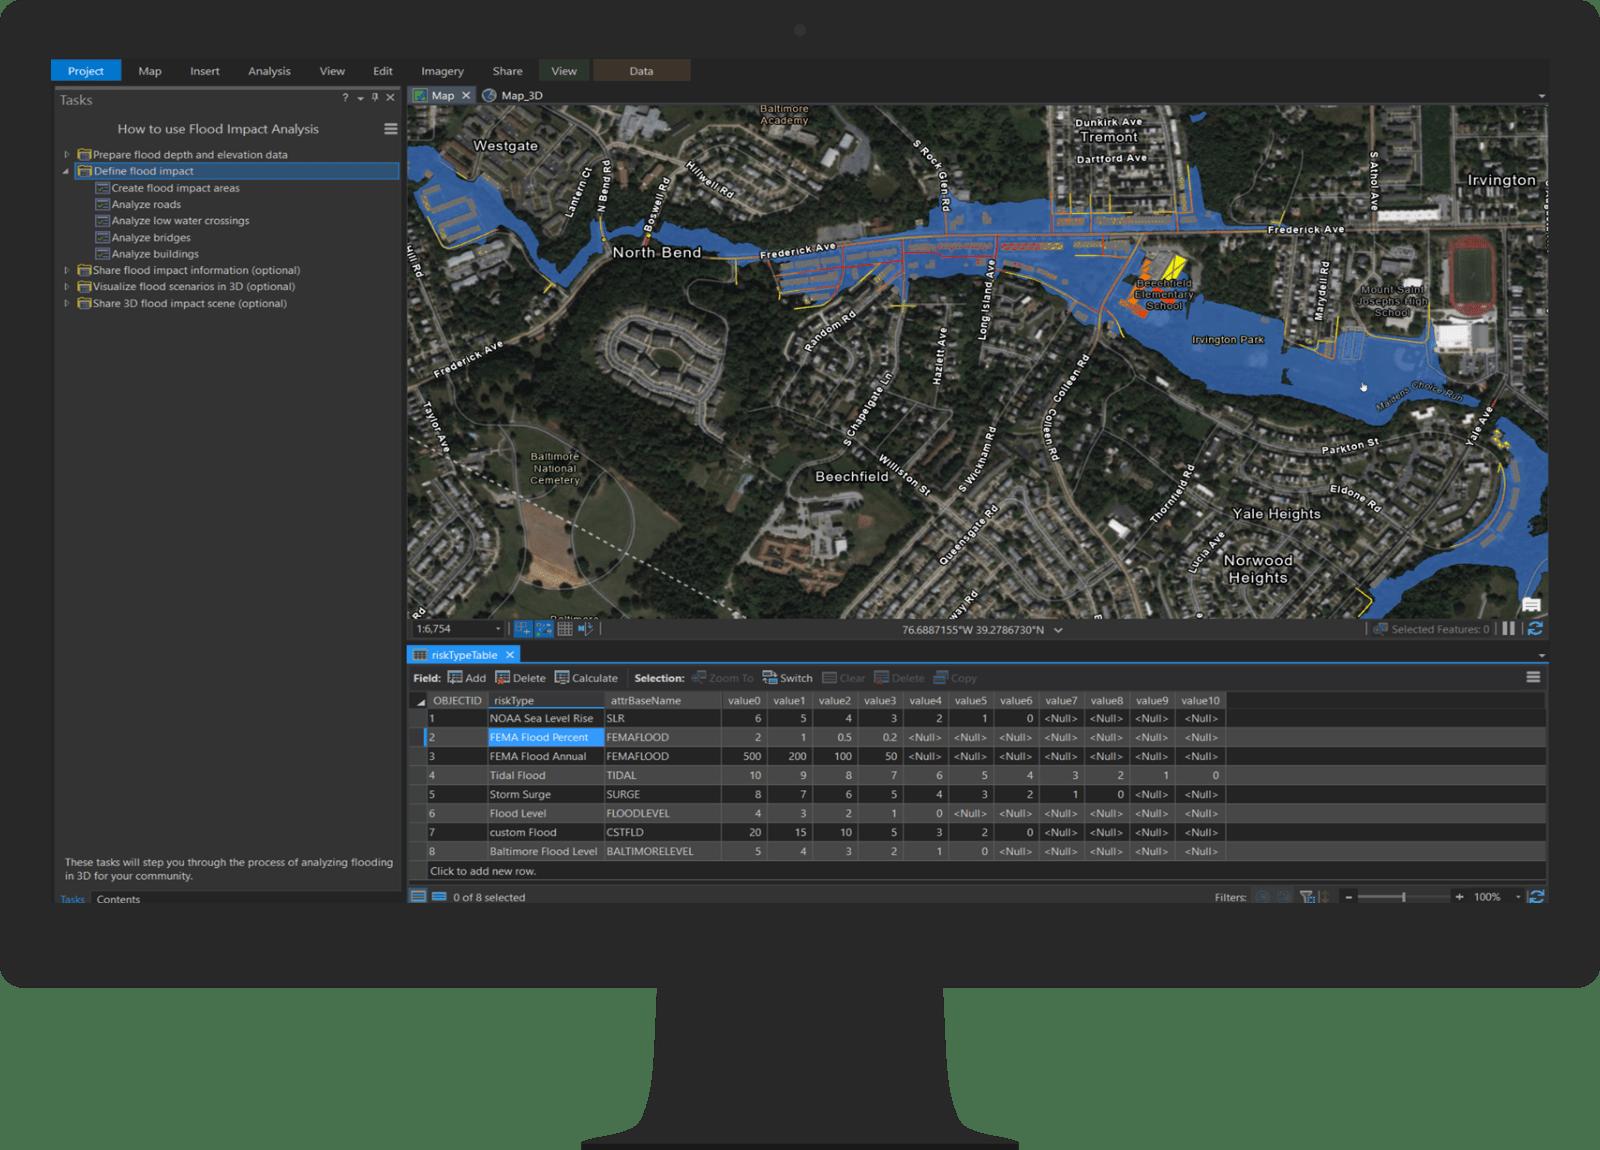 Flood Impact Analysis